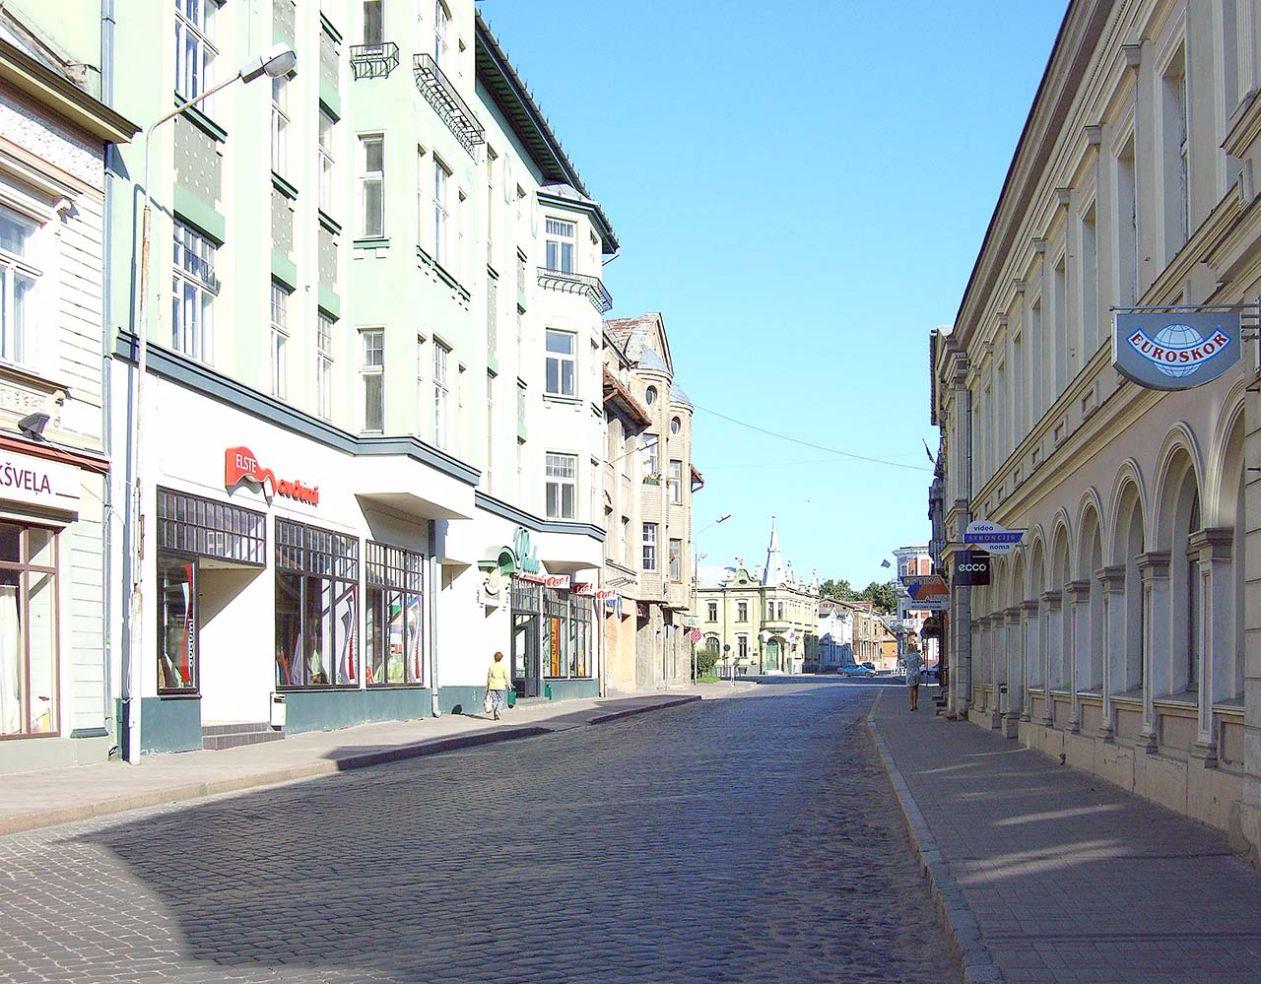 Strassenszene in Liepaja, Lettland. Bild: Ventus Reisen